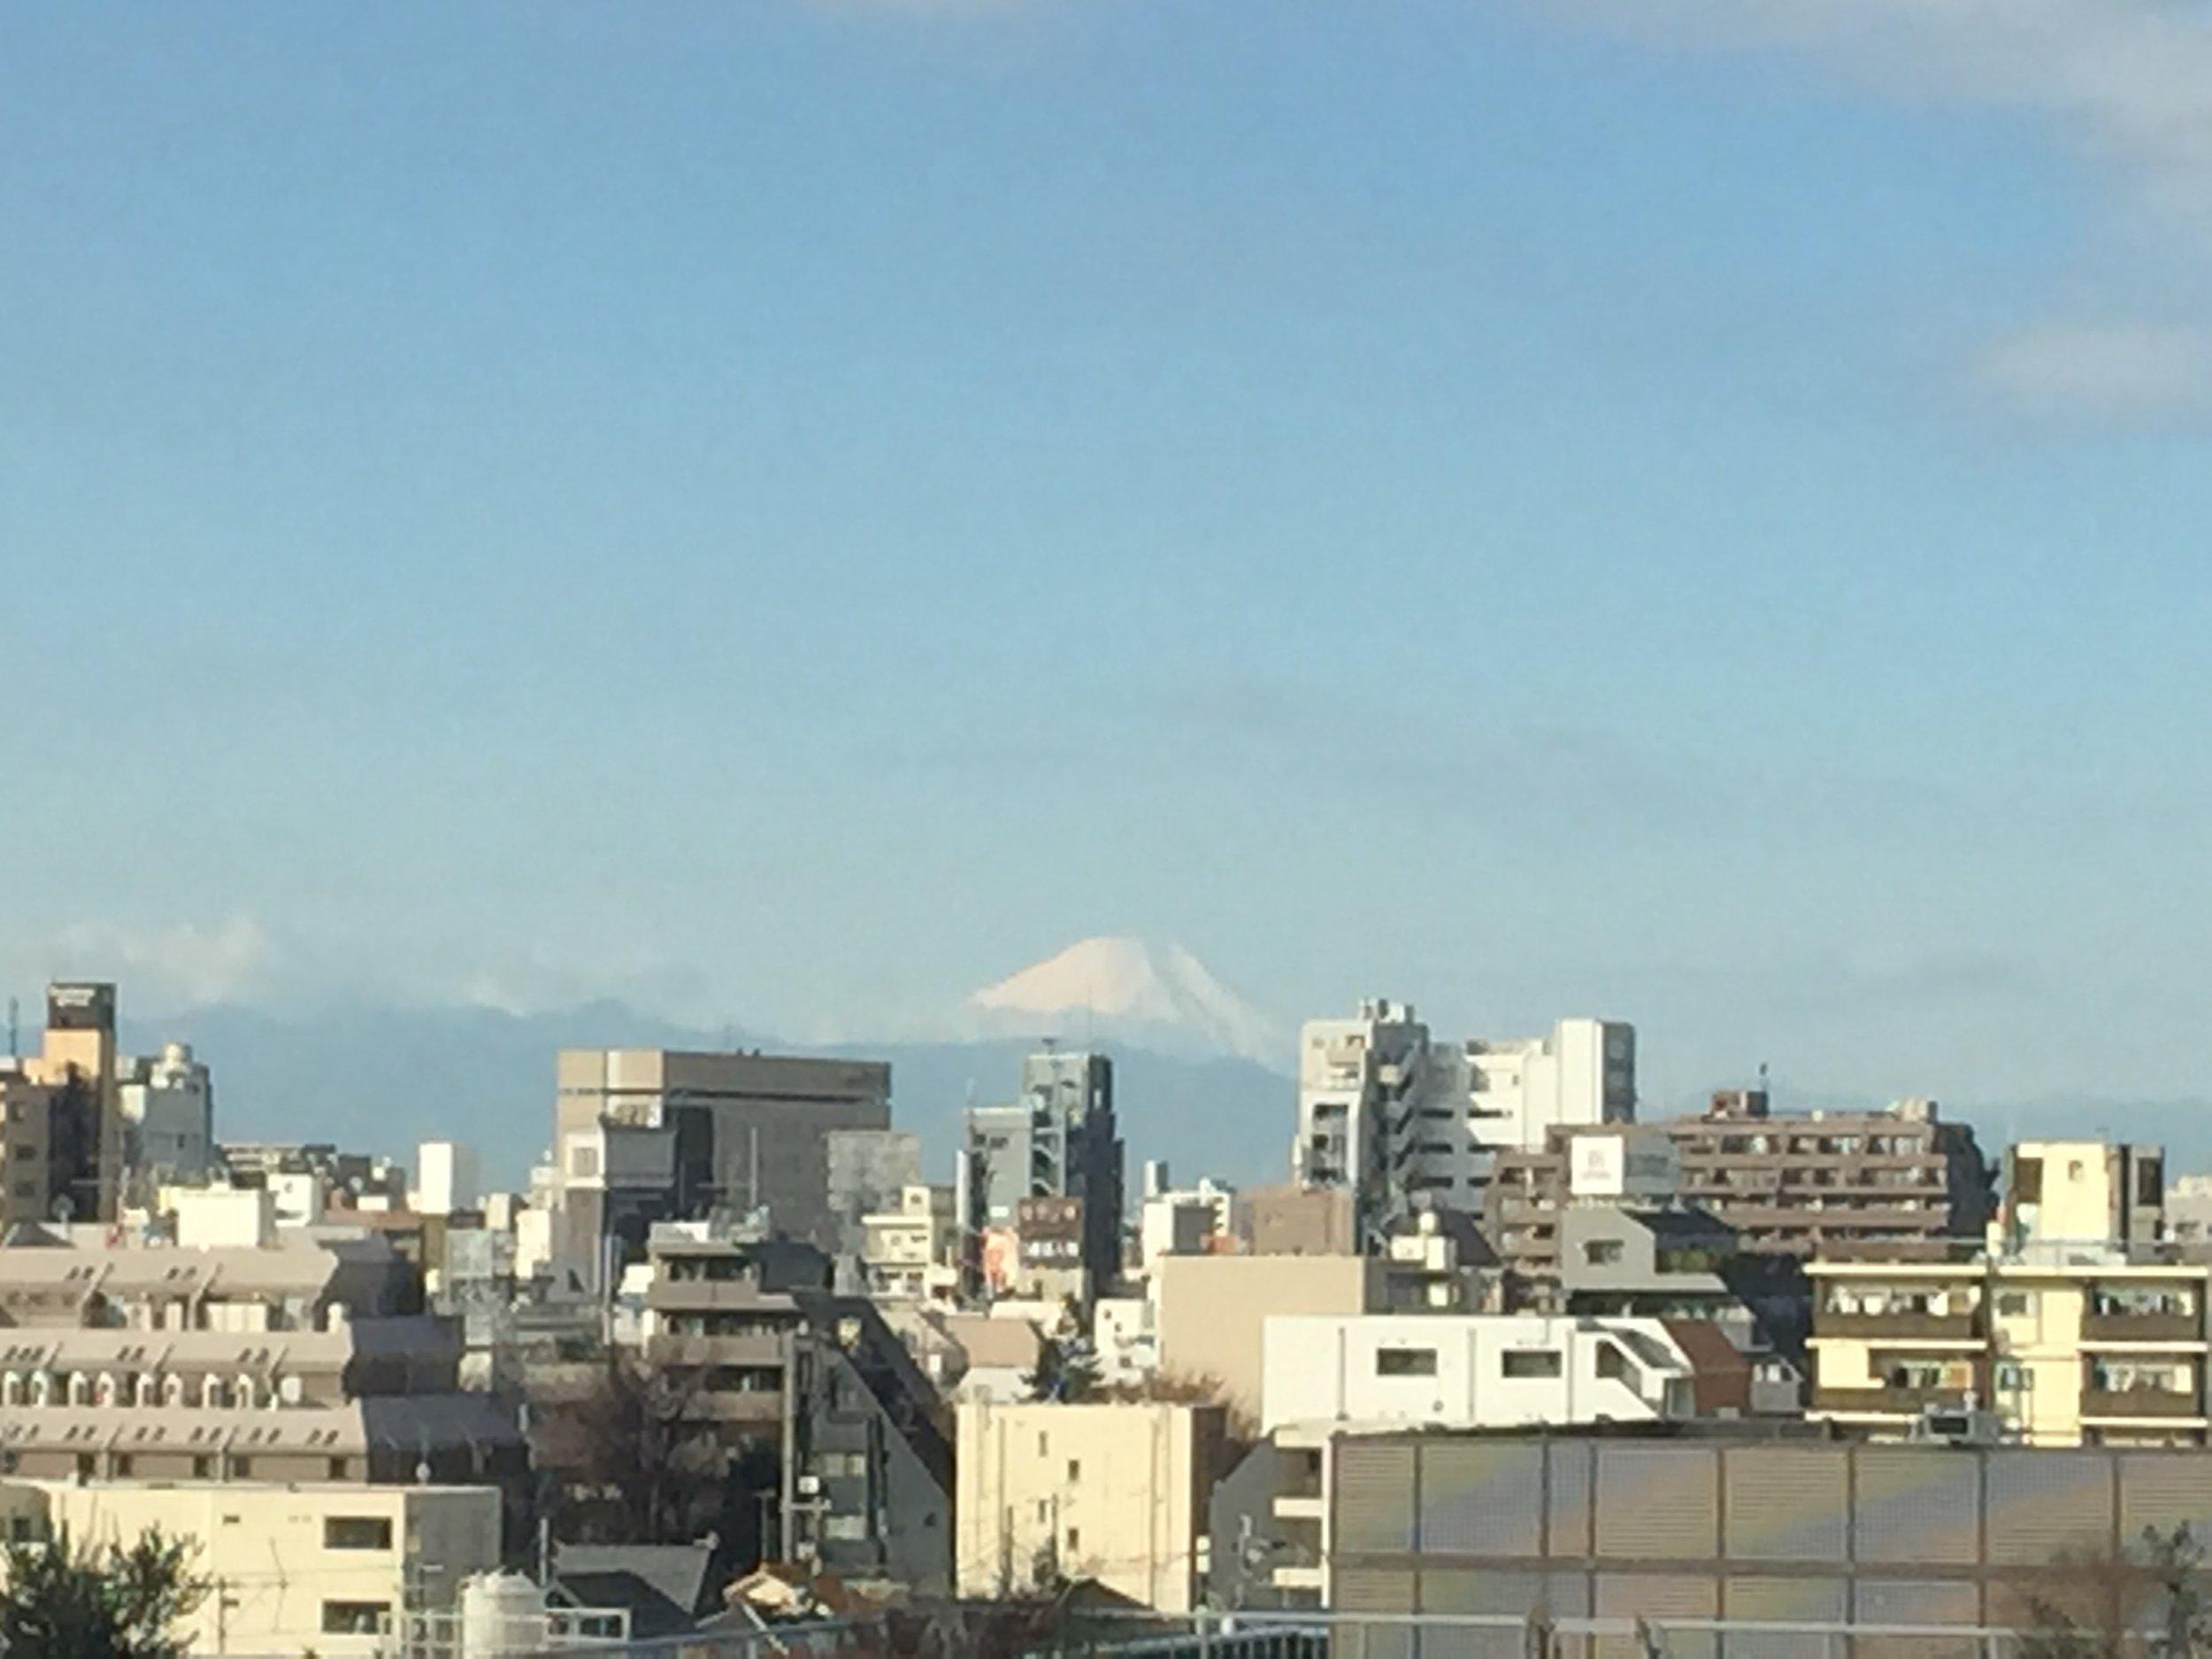 Mountain Fuji view from Waseda International Student House, Nakano, Tokyo